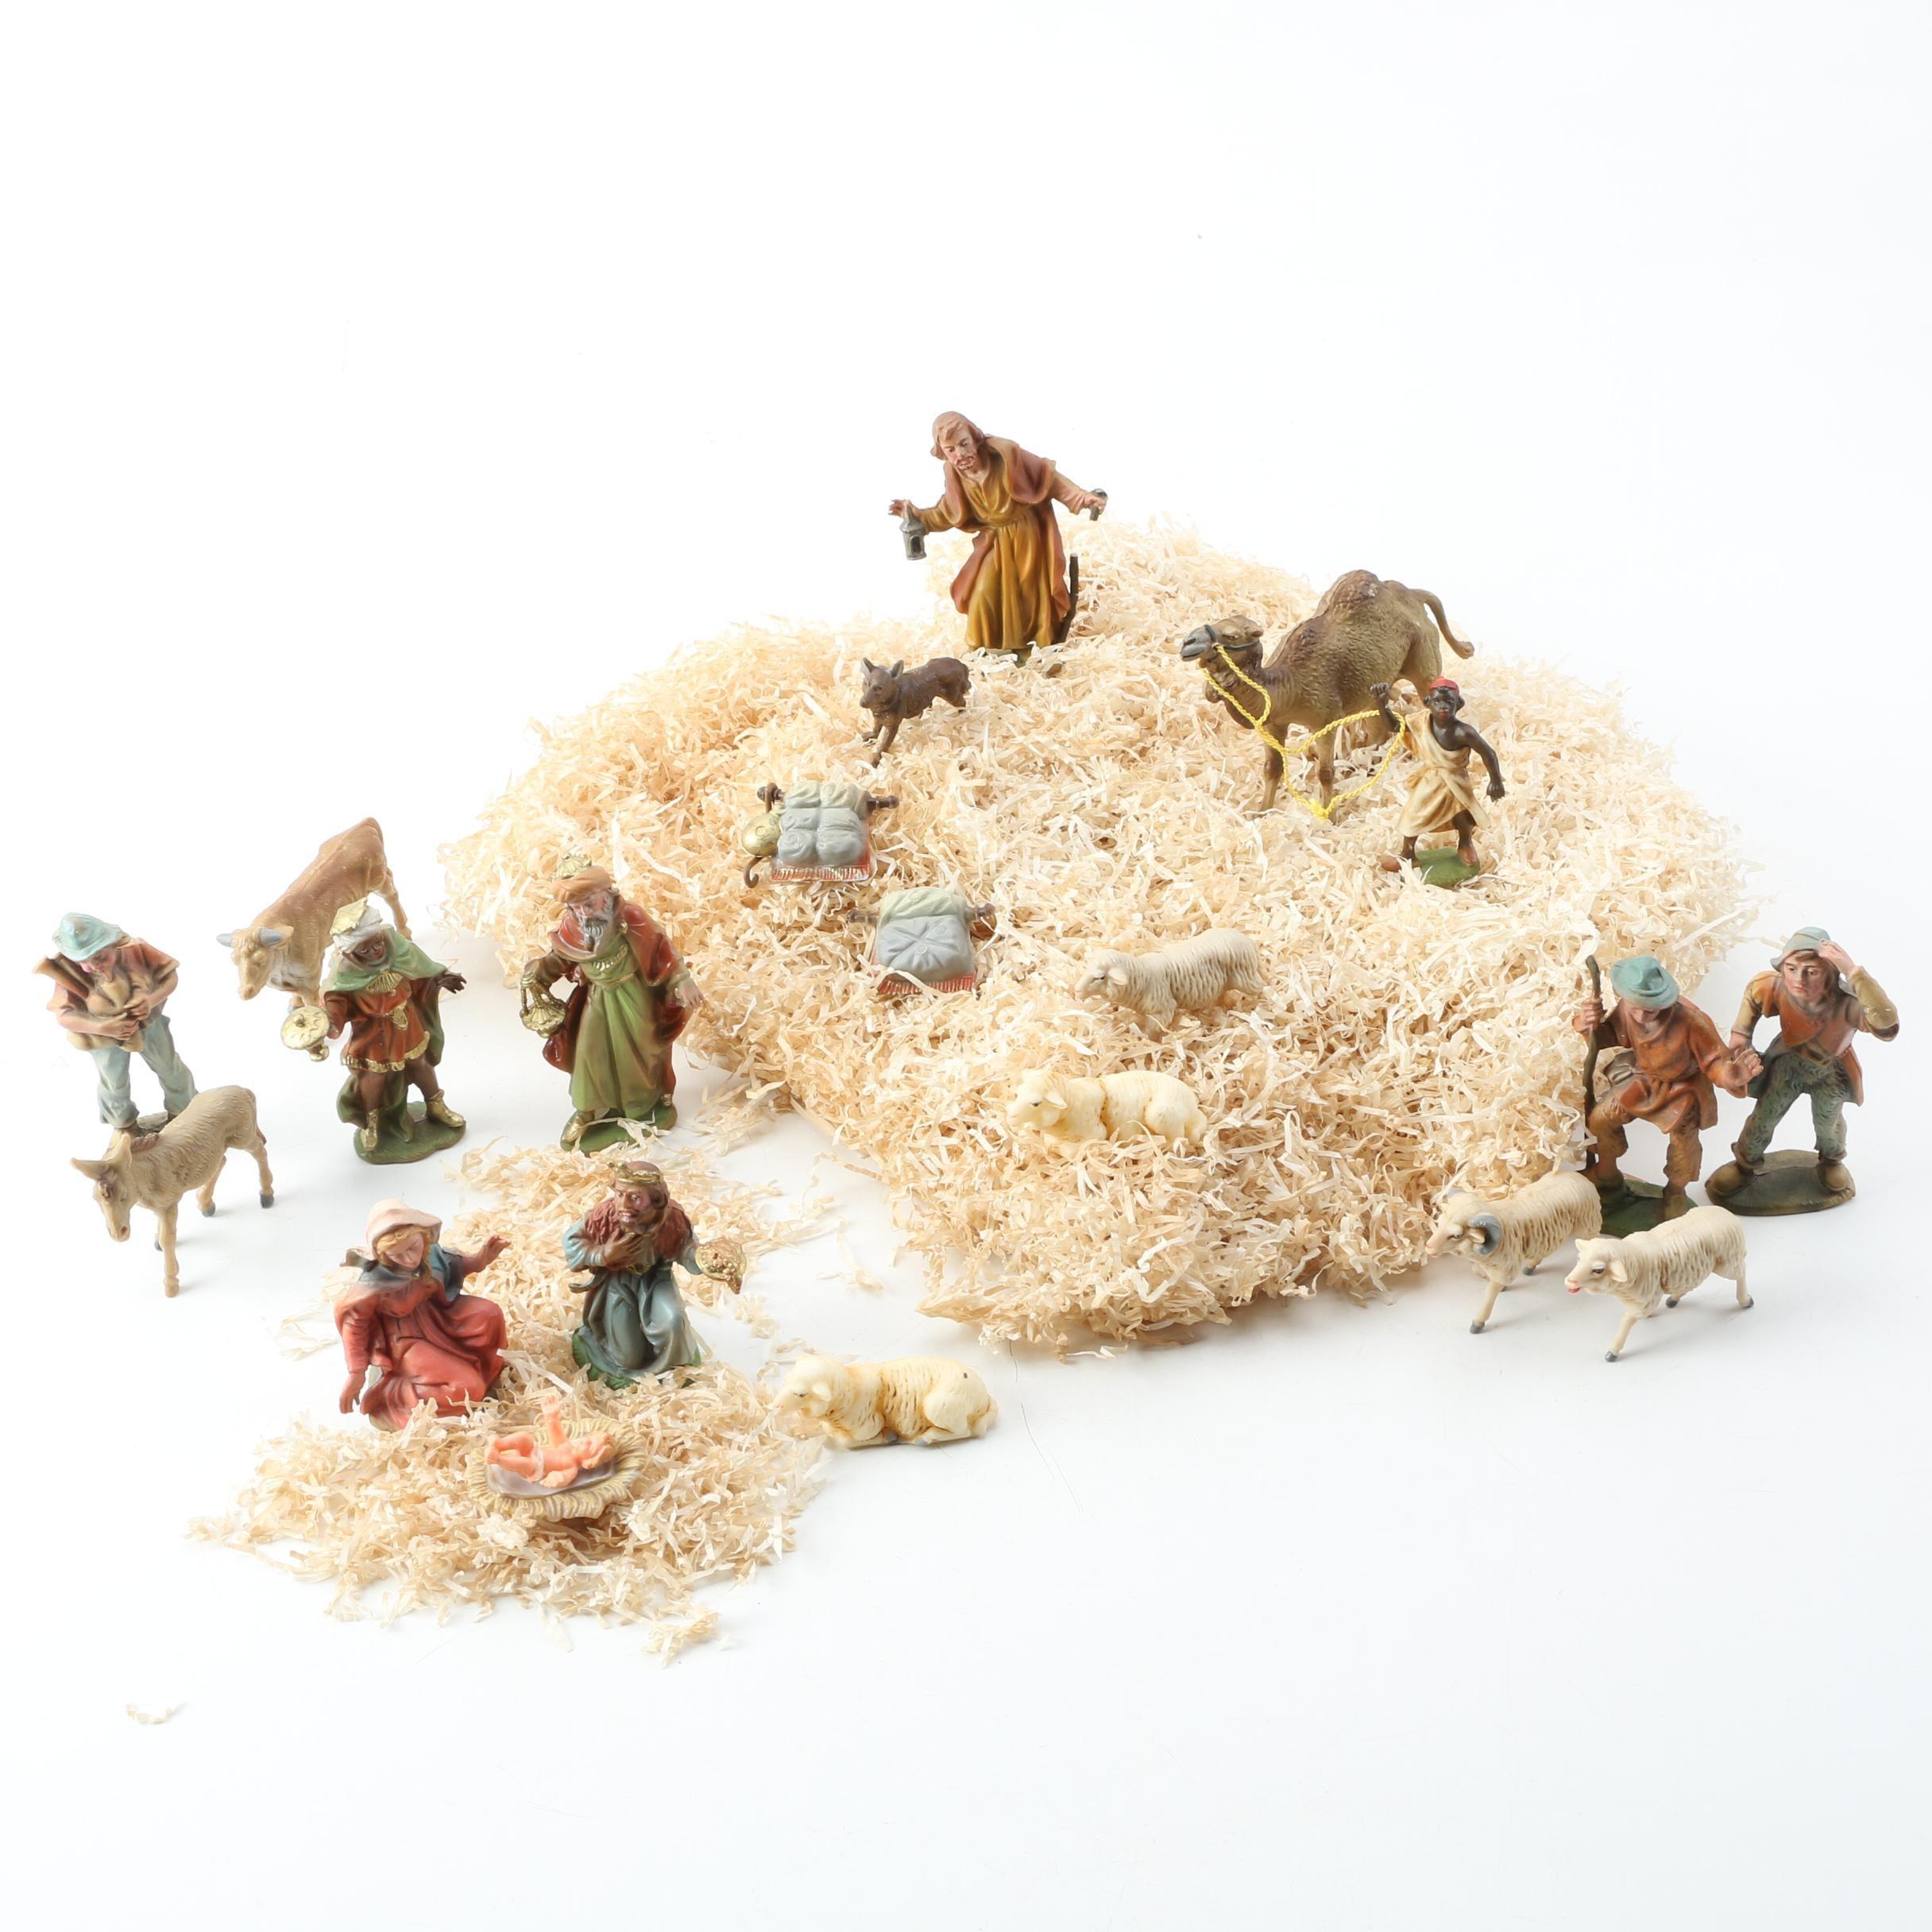 Nativity Scene by Marolin